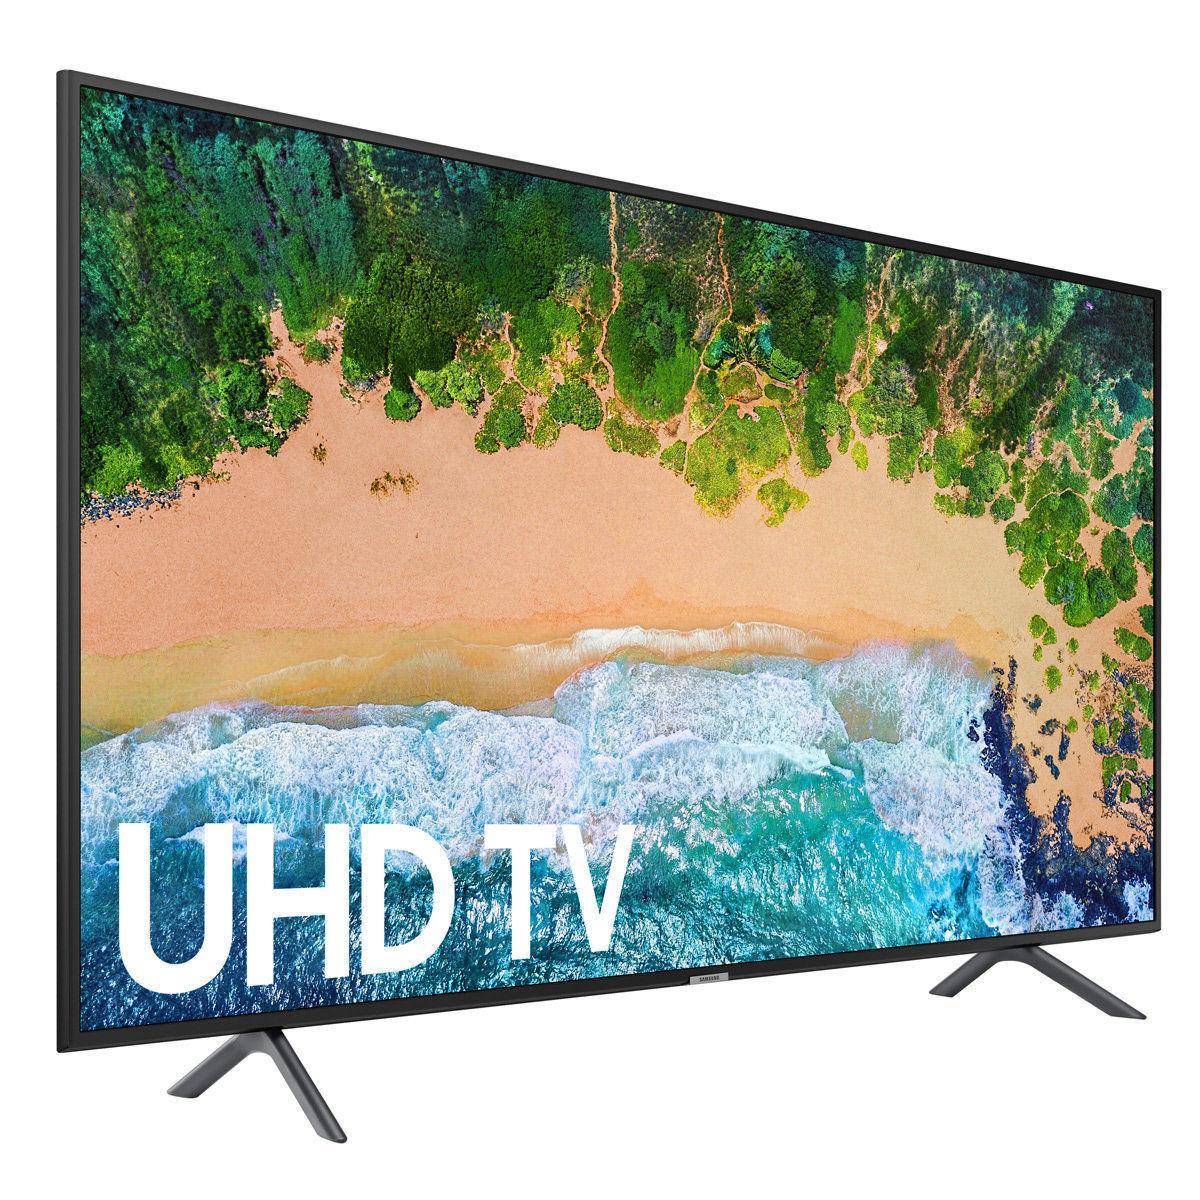 Led UHD Smart Tv 65Inch Samsung Type:65NU7100 (Khusus Daerah Medan)